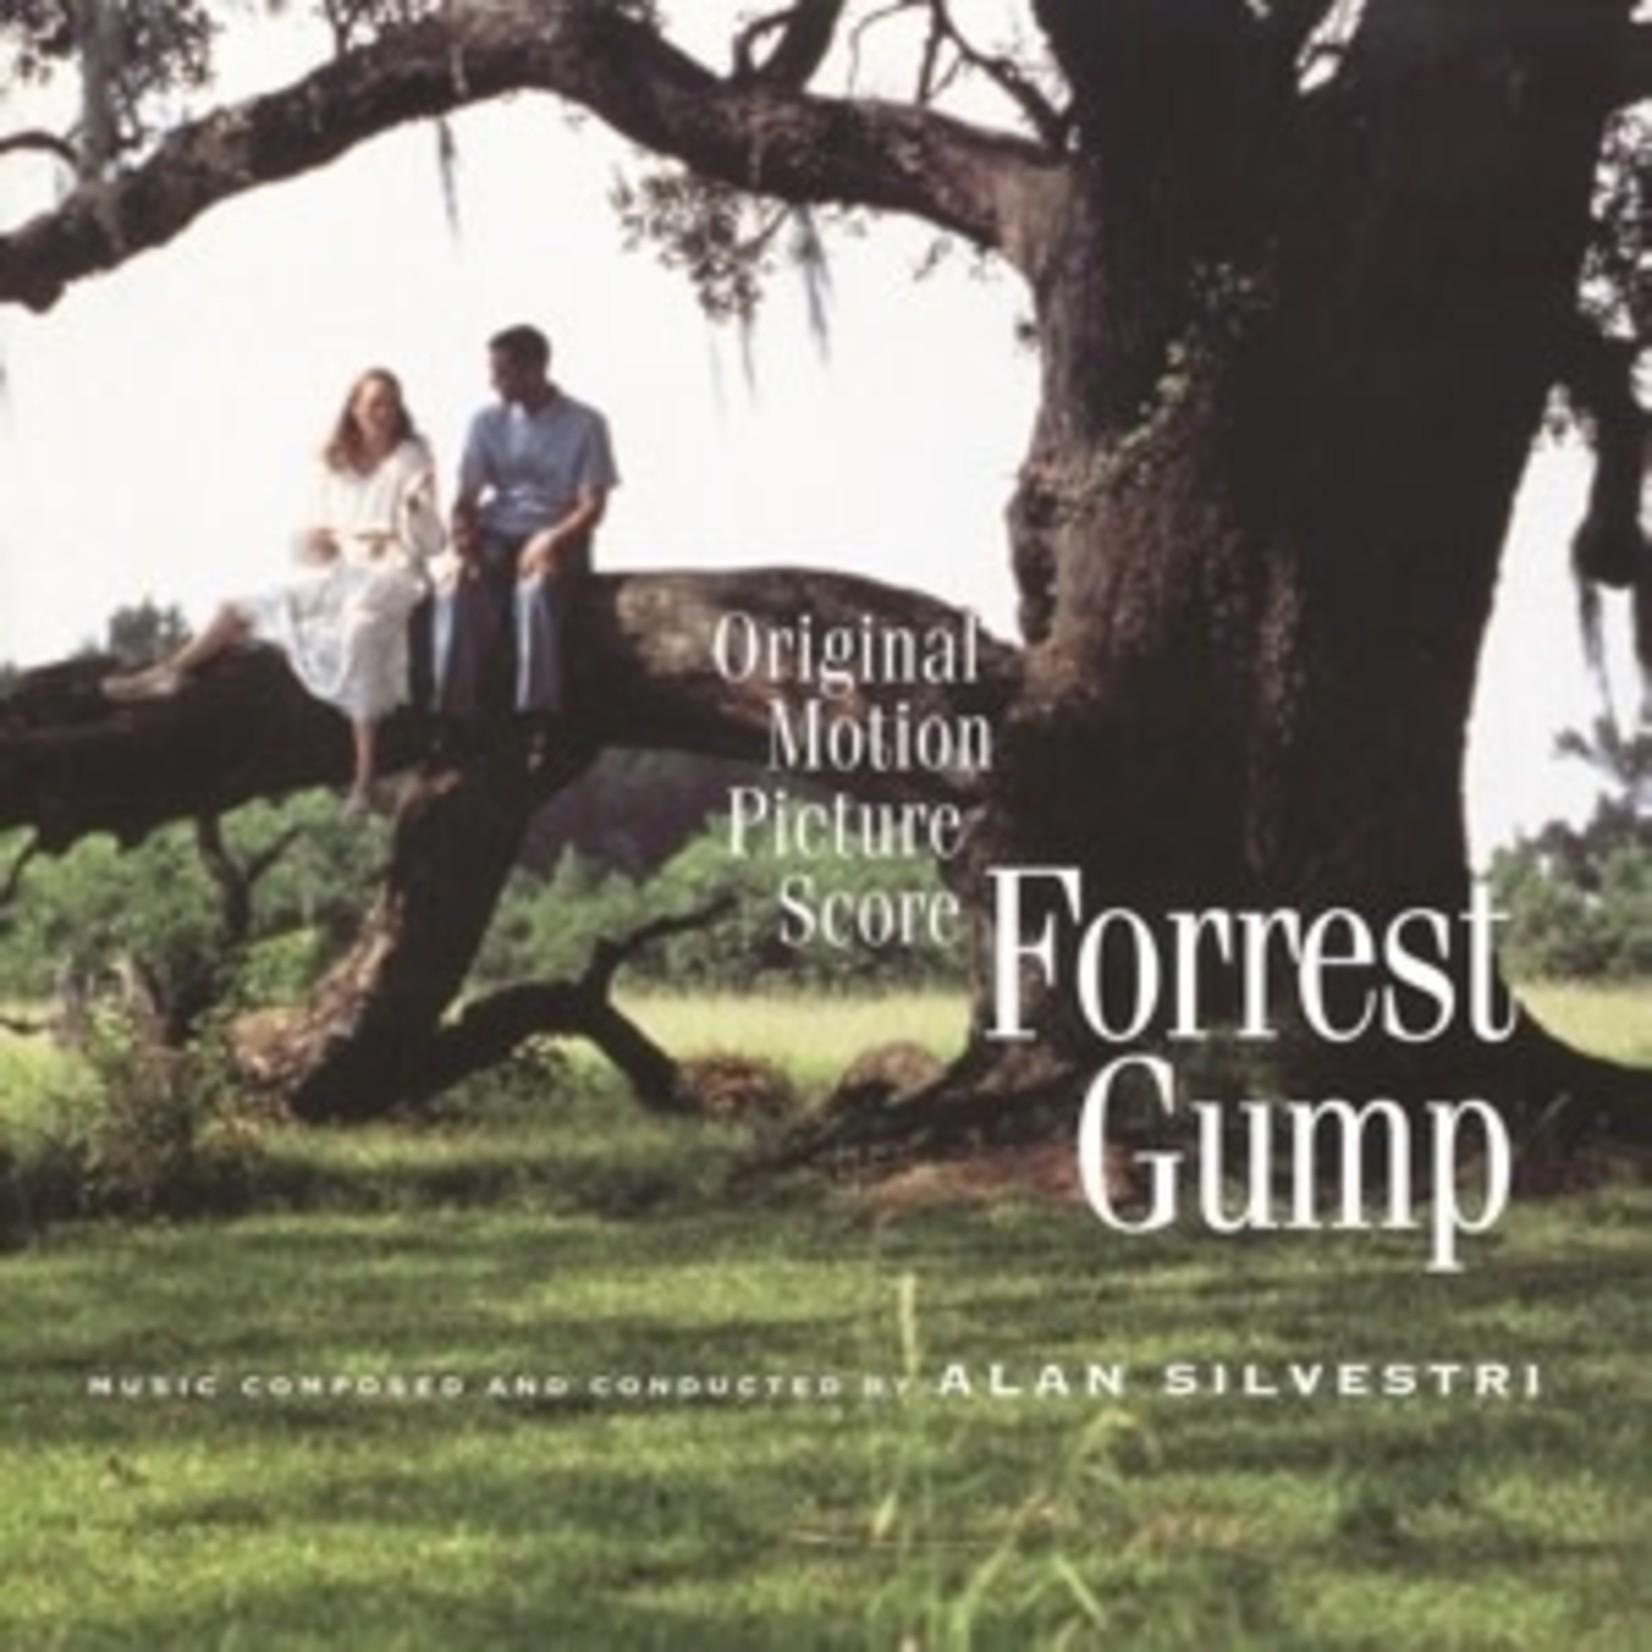 OST - Forrest Gump (Score)   (VINYL)